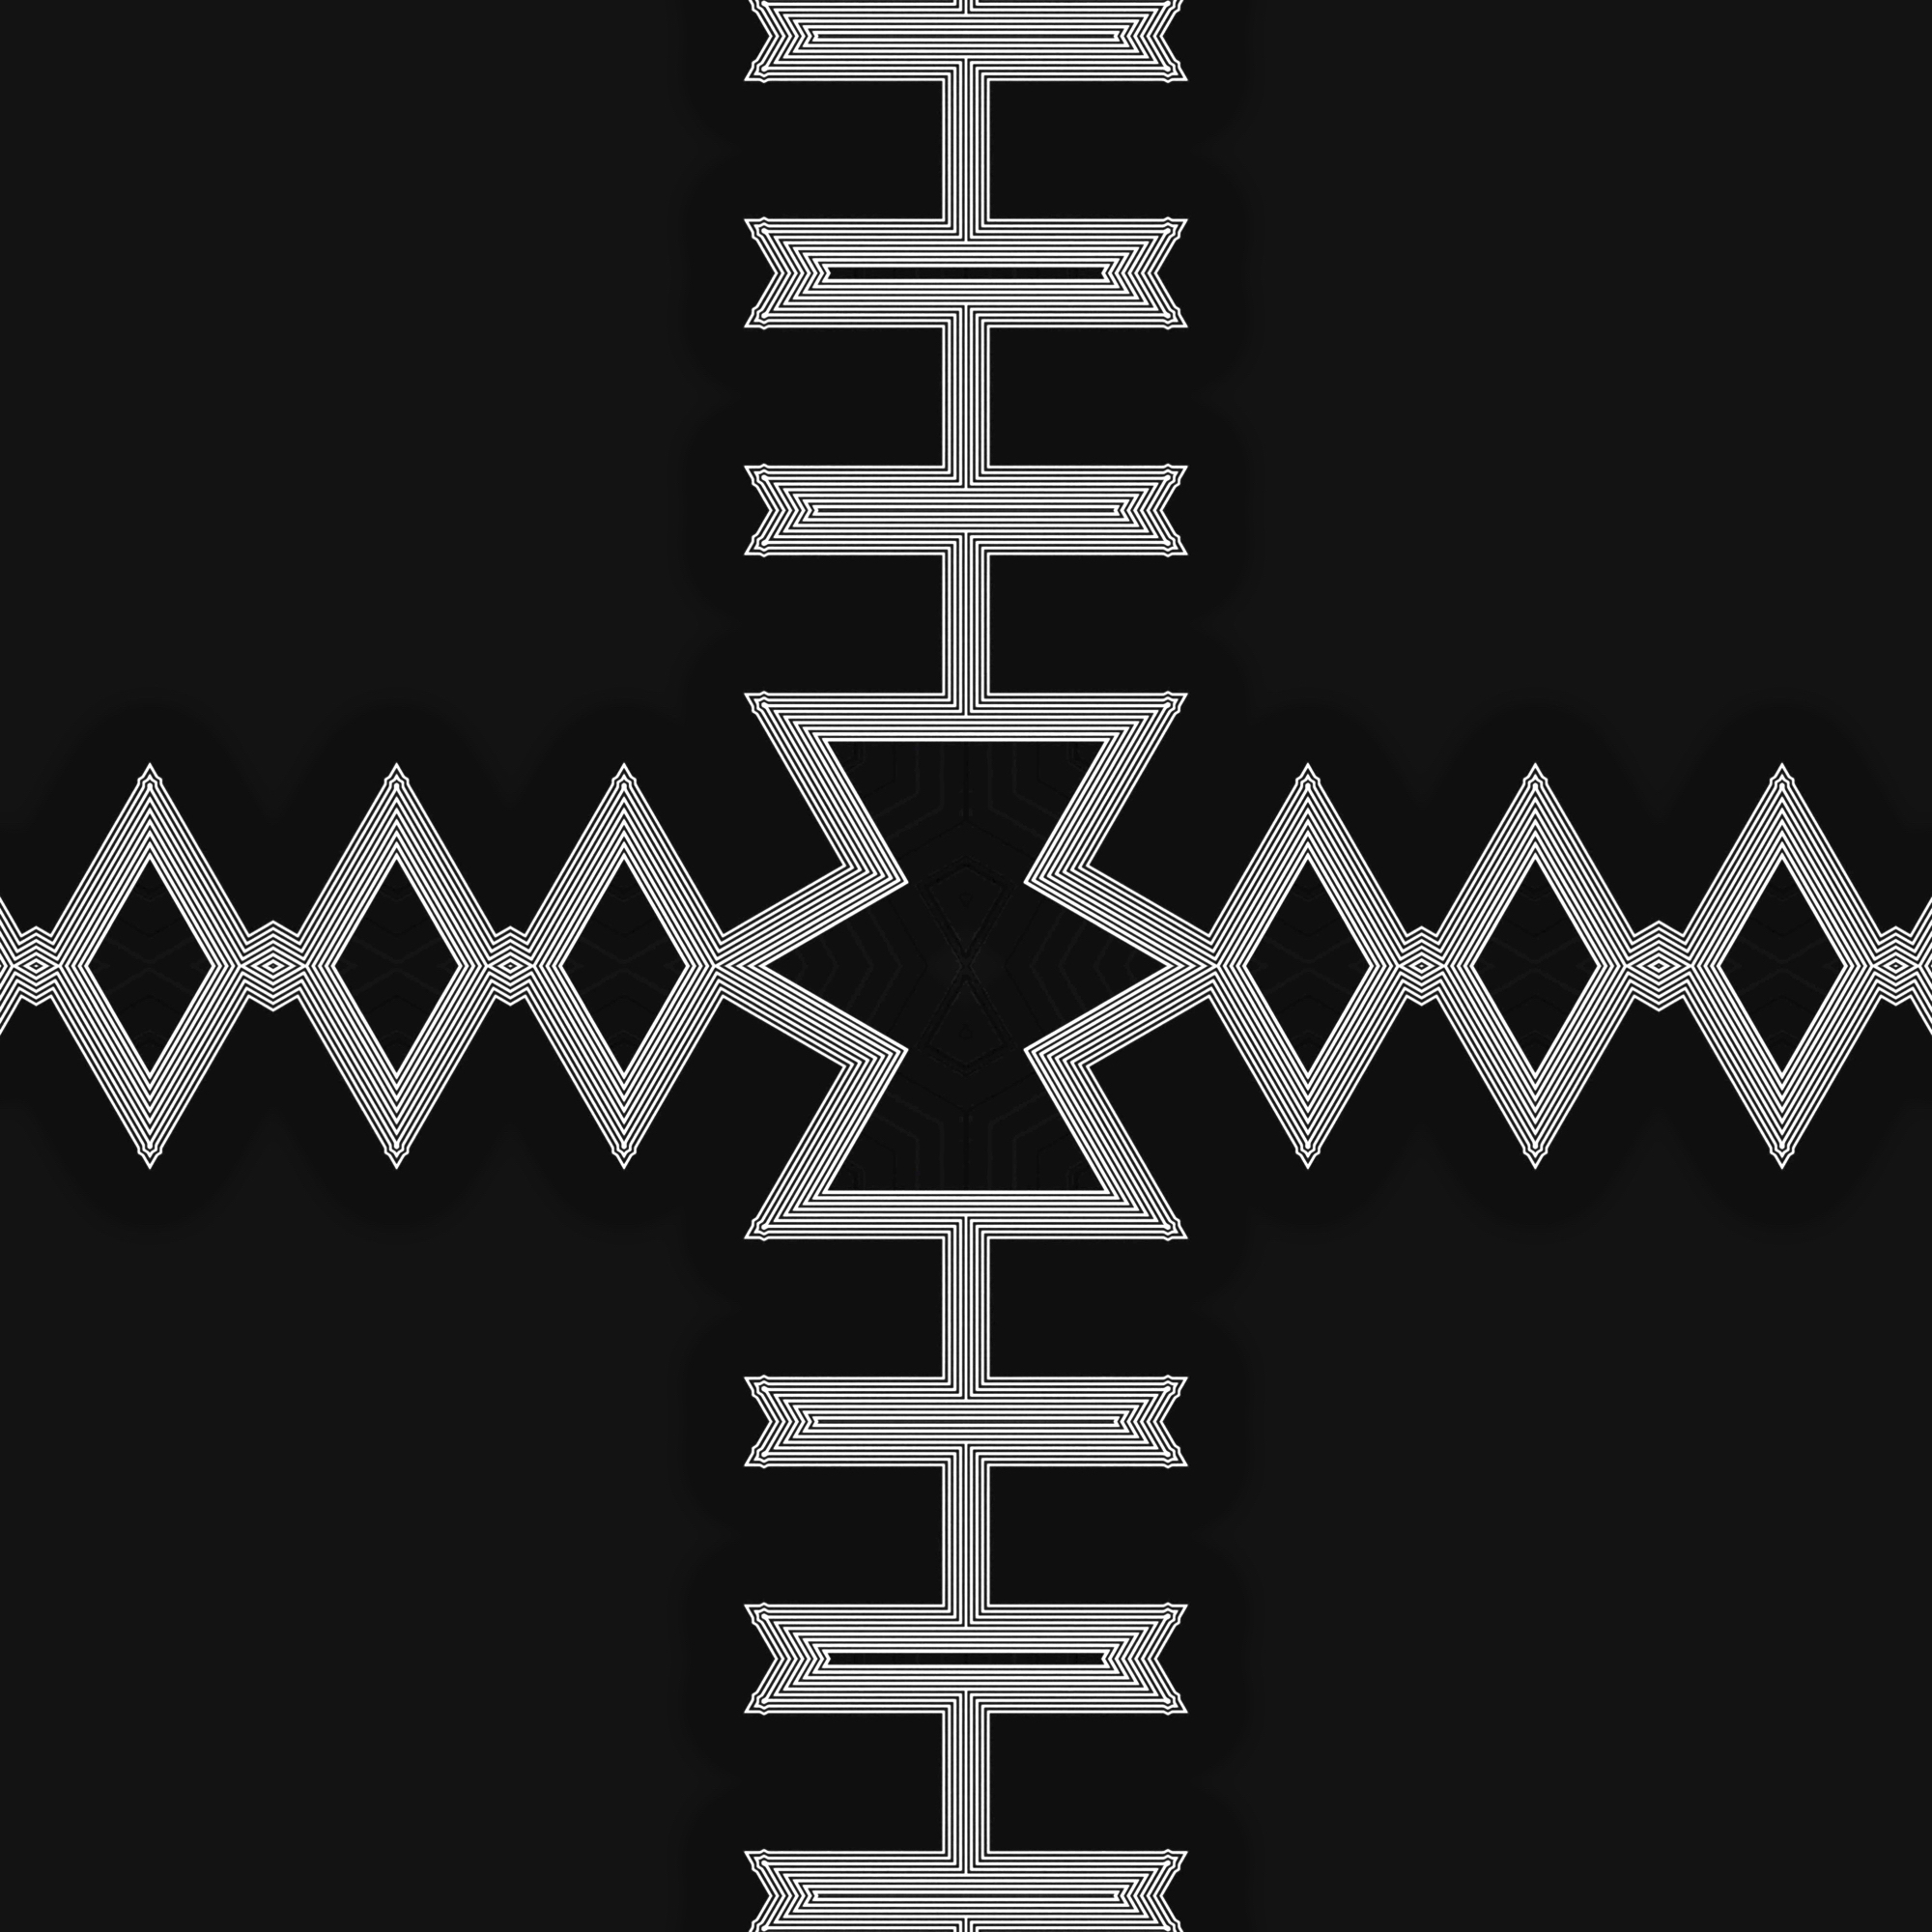 Geometrics 09